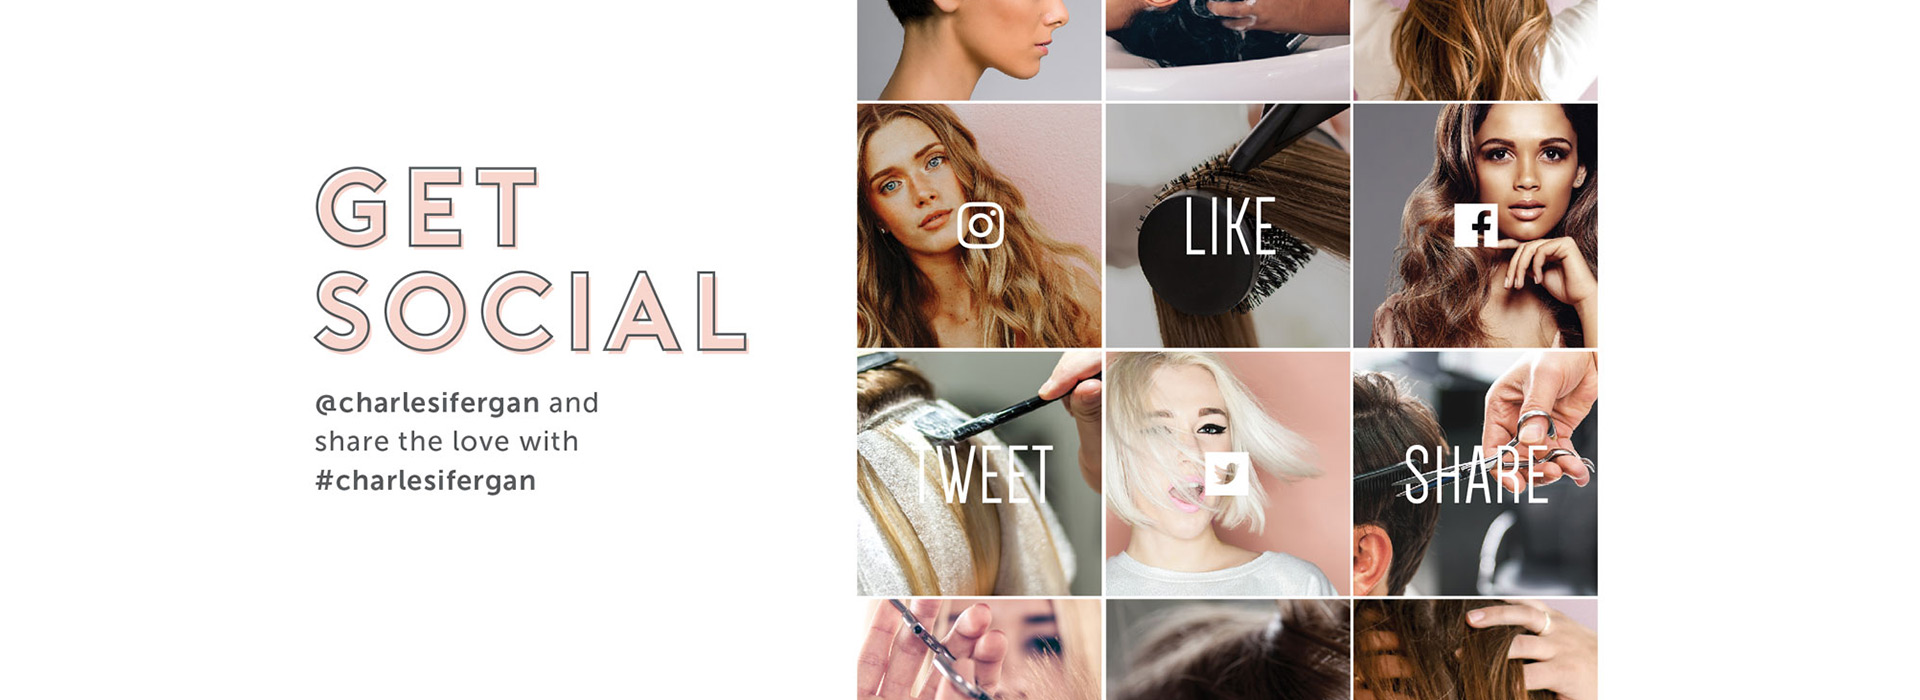 Get Social @charlesifergan on instagram, twitter, and facebook